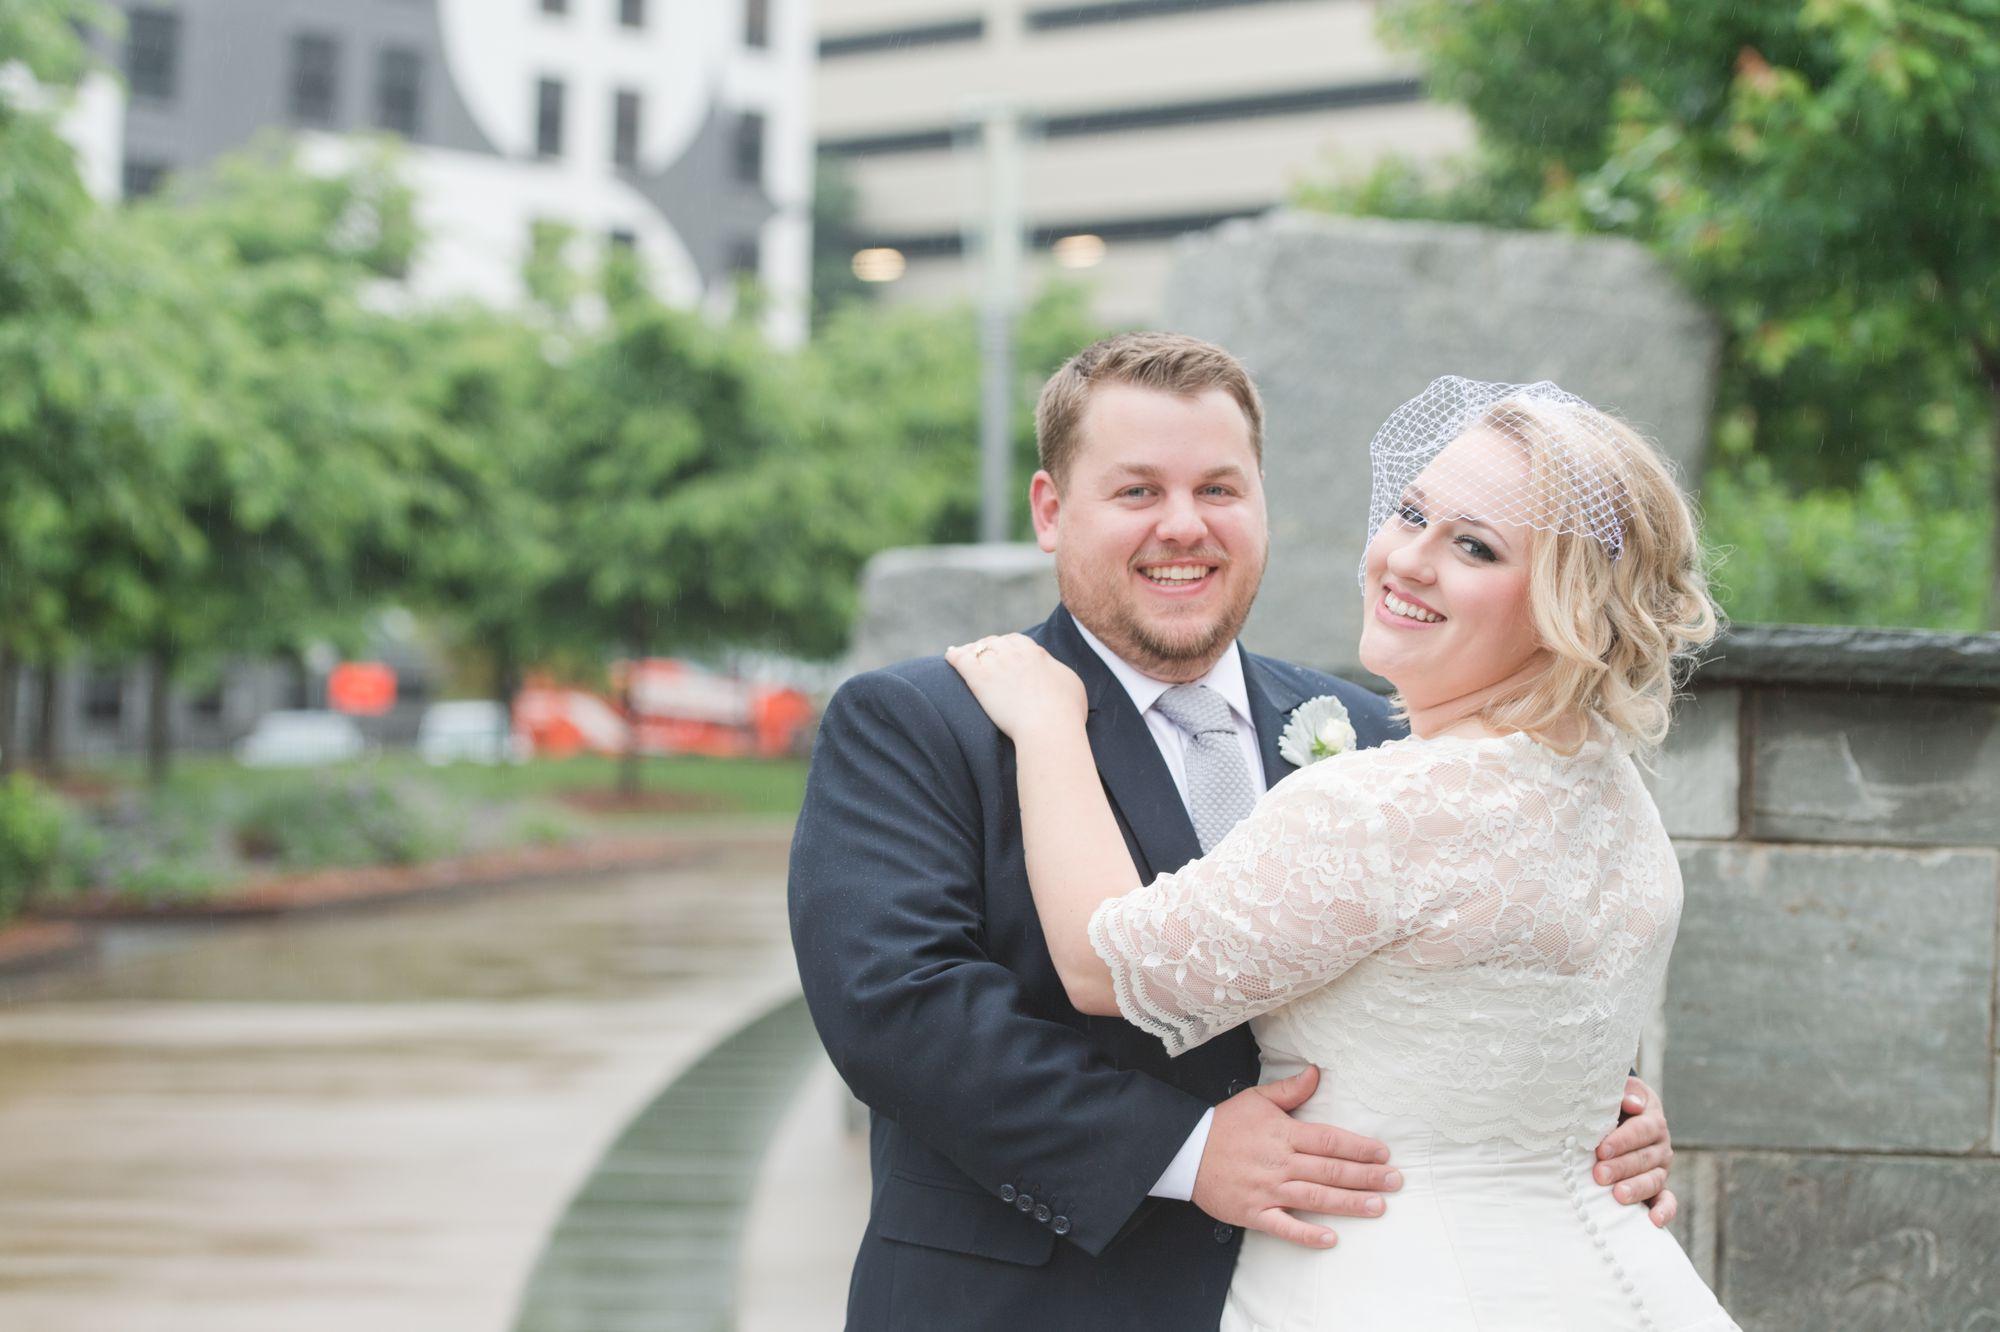 uptown-charlotte-warhouse-wedding 34